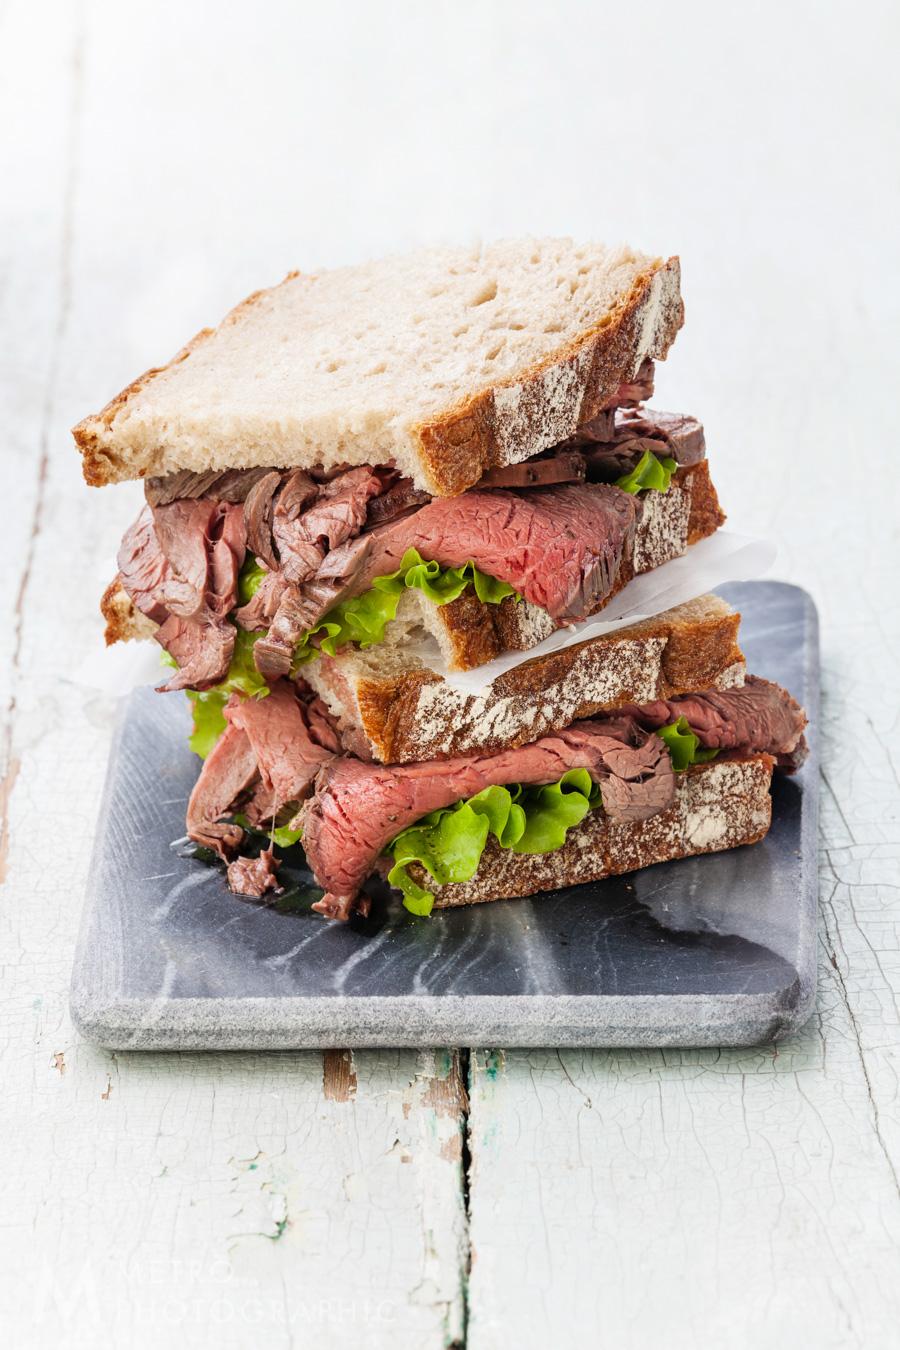 LN_rb-sandwich_028.jpg